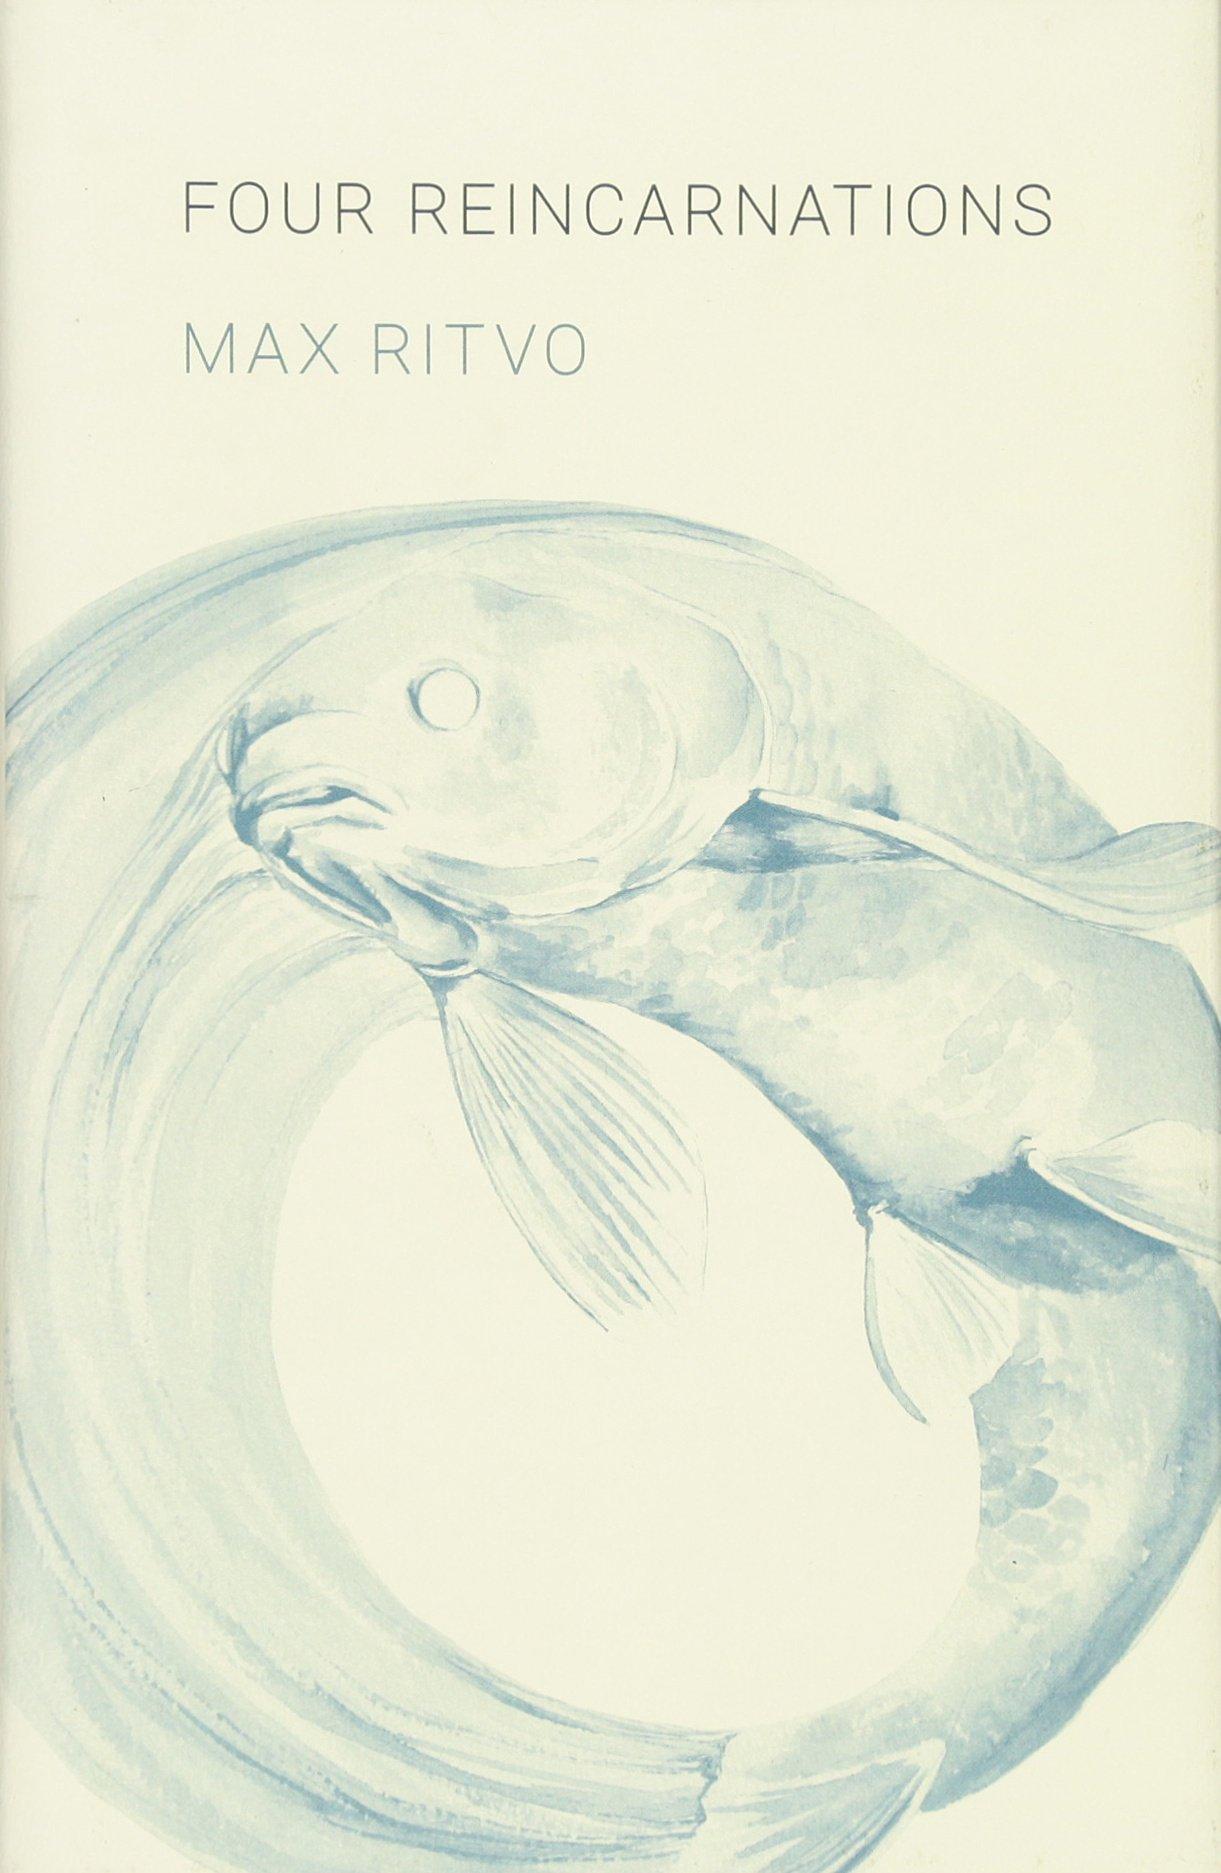 Four Reincarnations: Poems: Max Ritvo: 9781571314901: Amazon